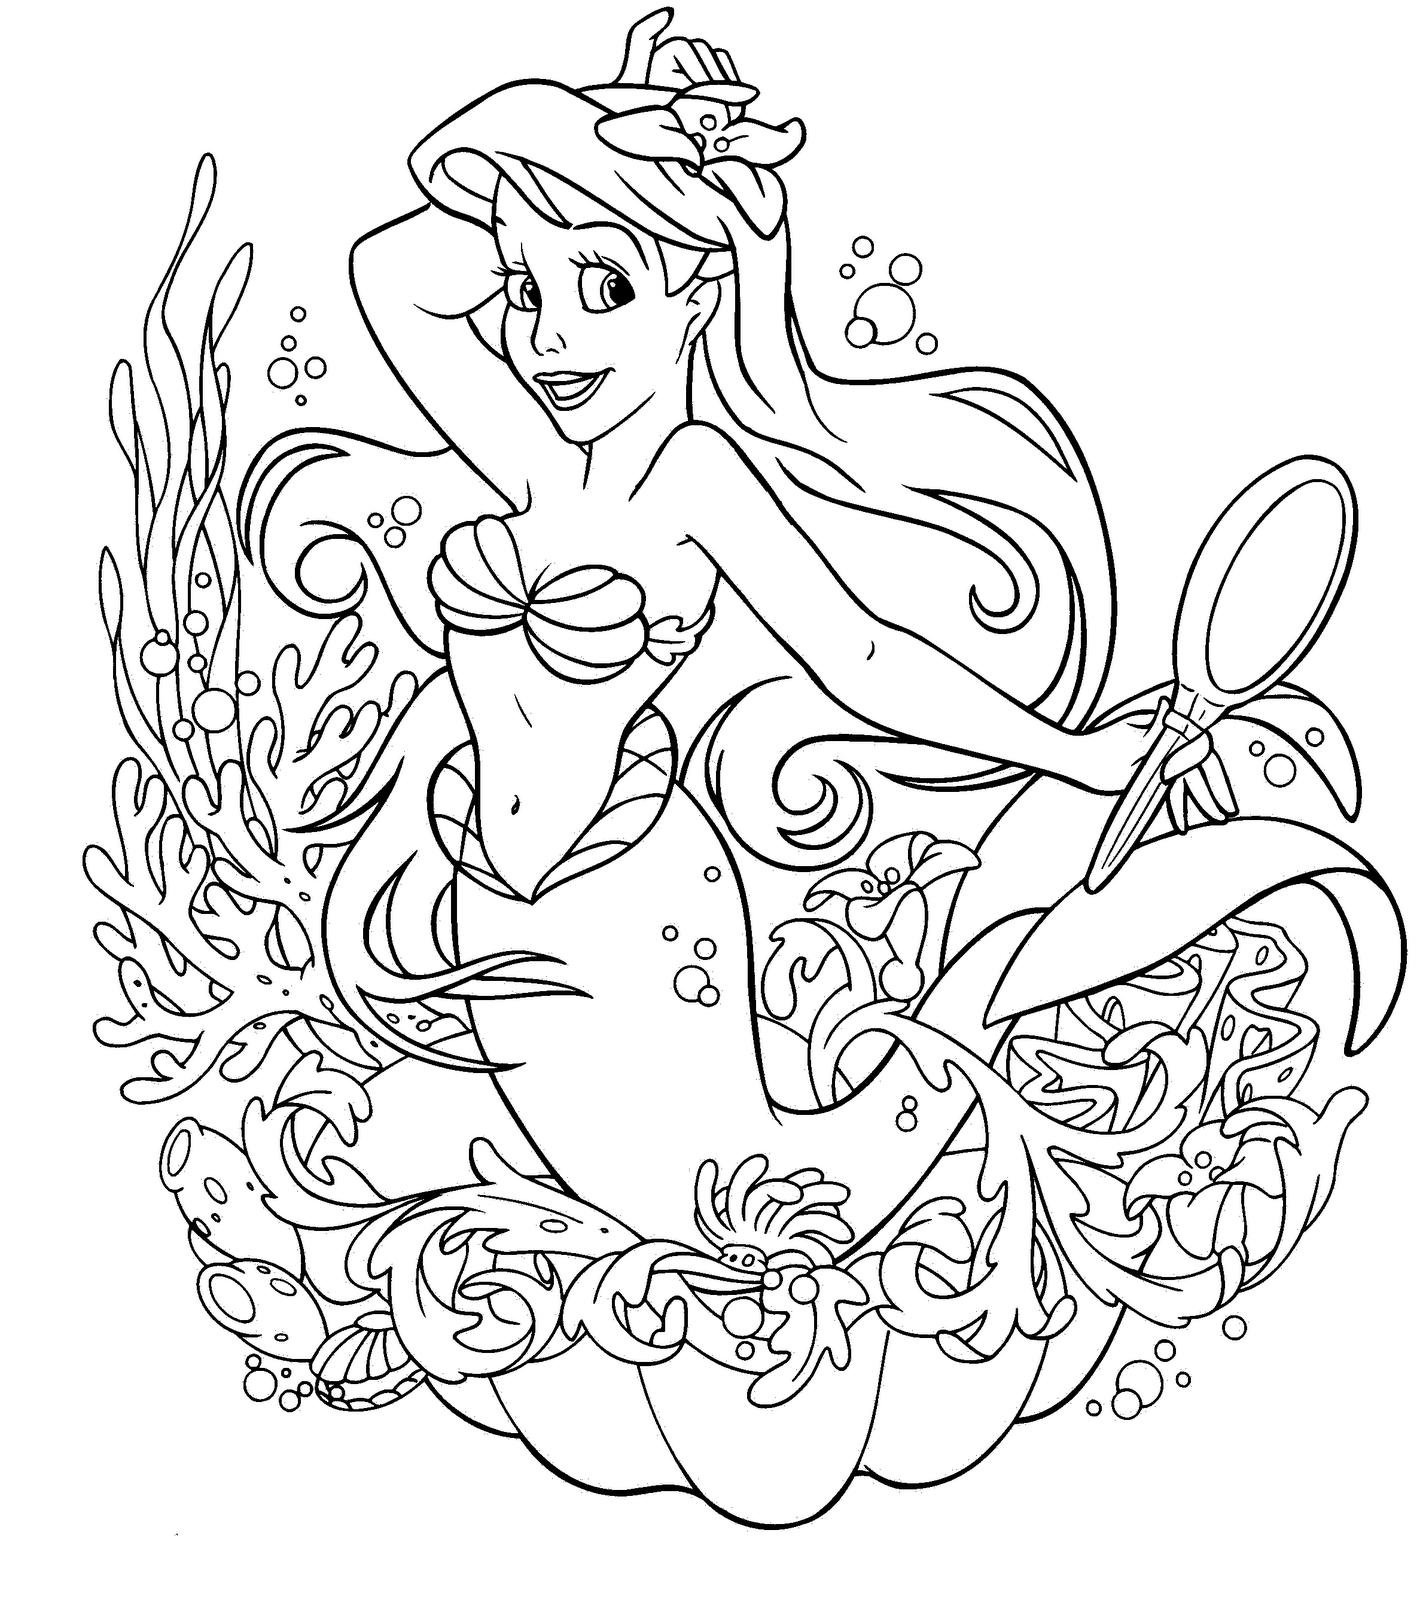 Disney Little Mermaid Coloring Page